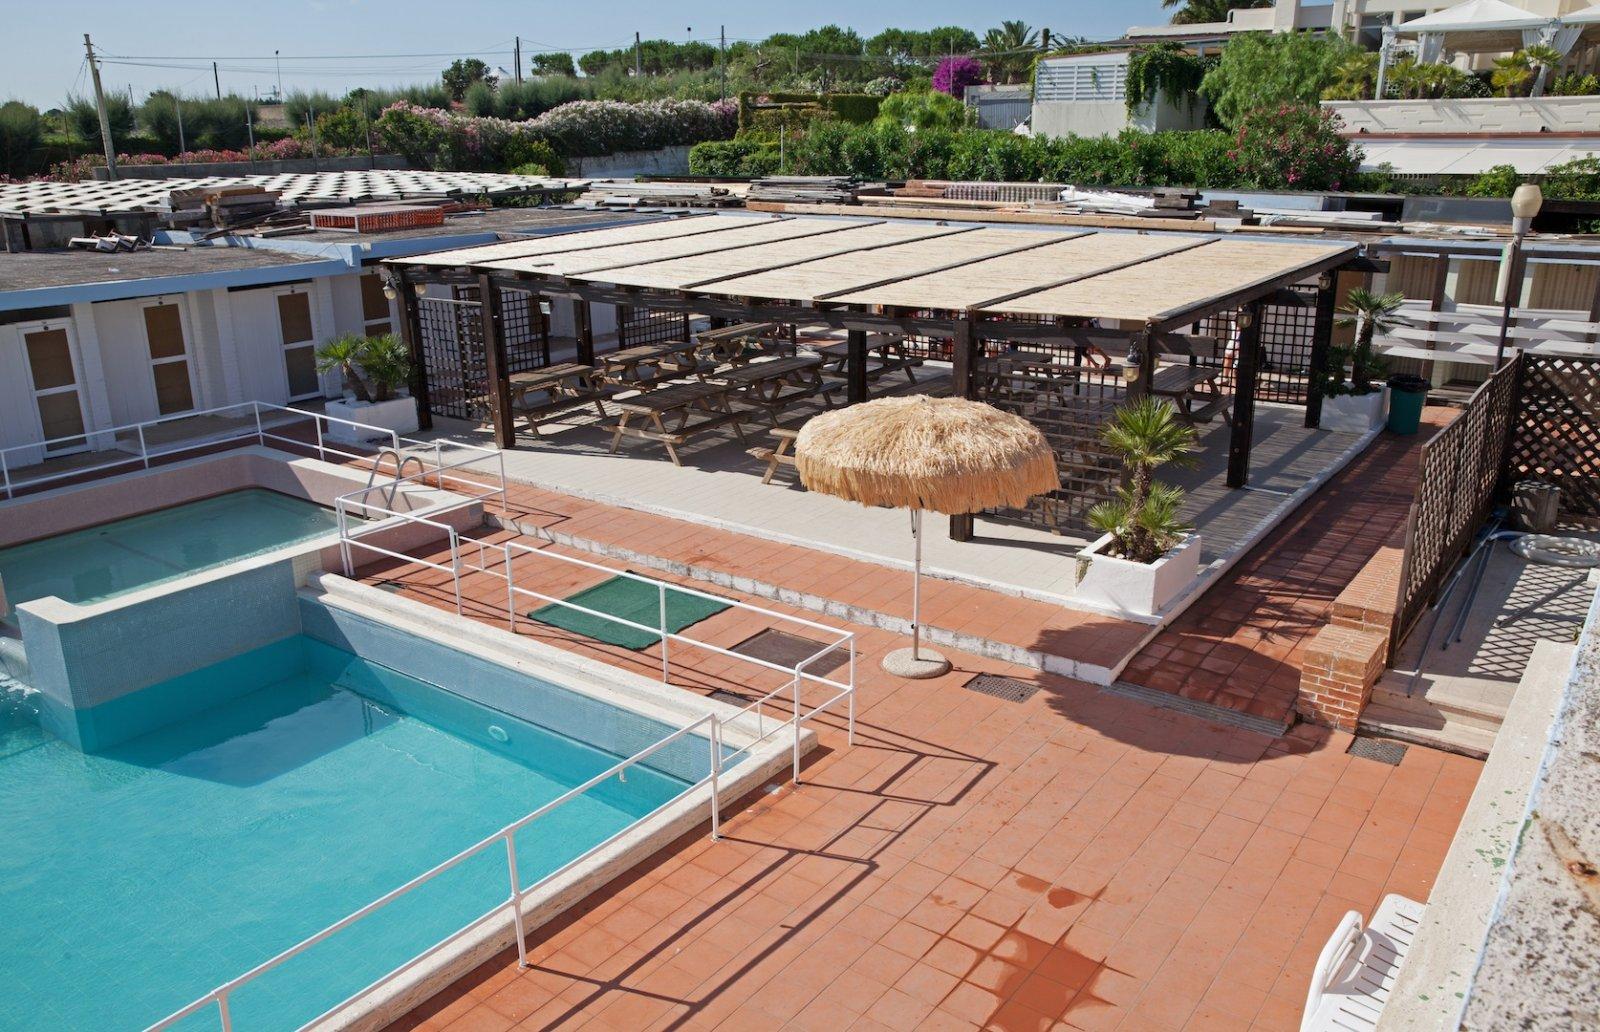 Villaggio Lido Nettuno  Buen Vivir  summer places a Molfetta